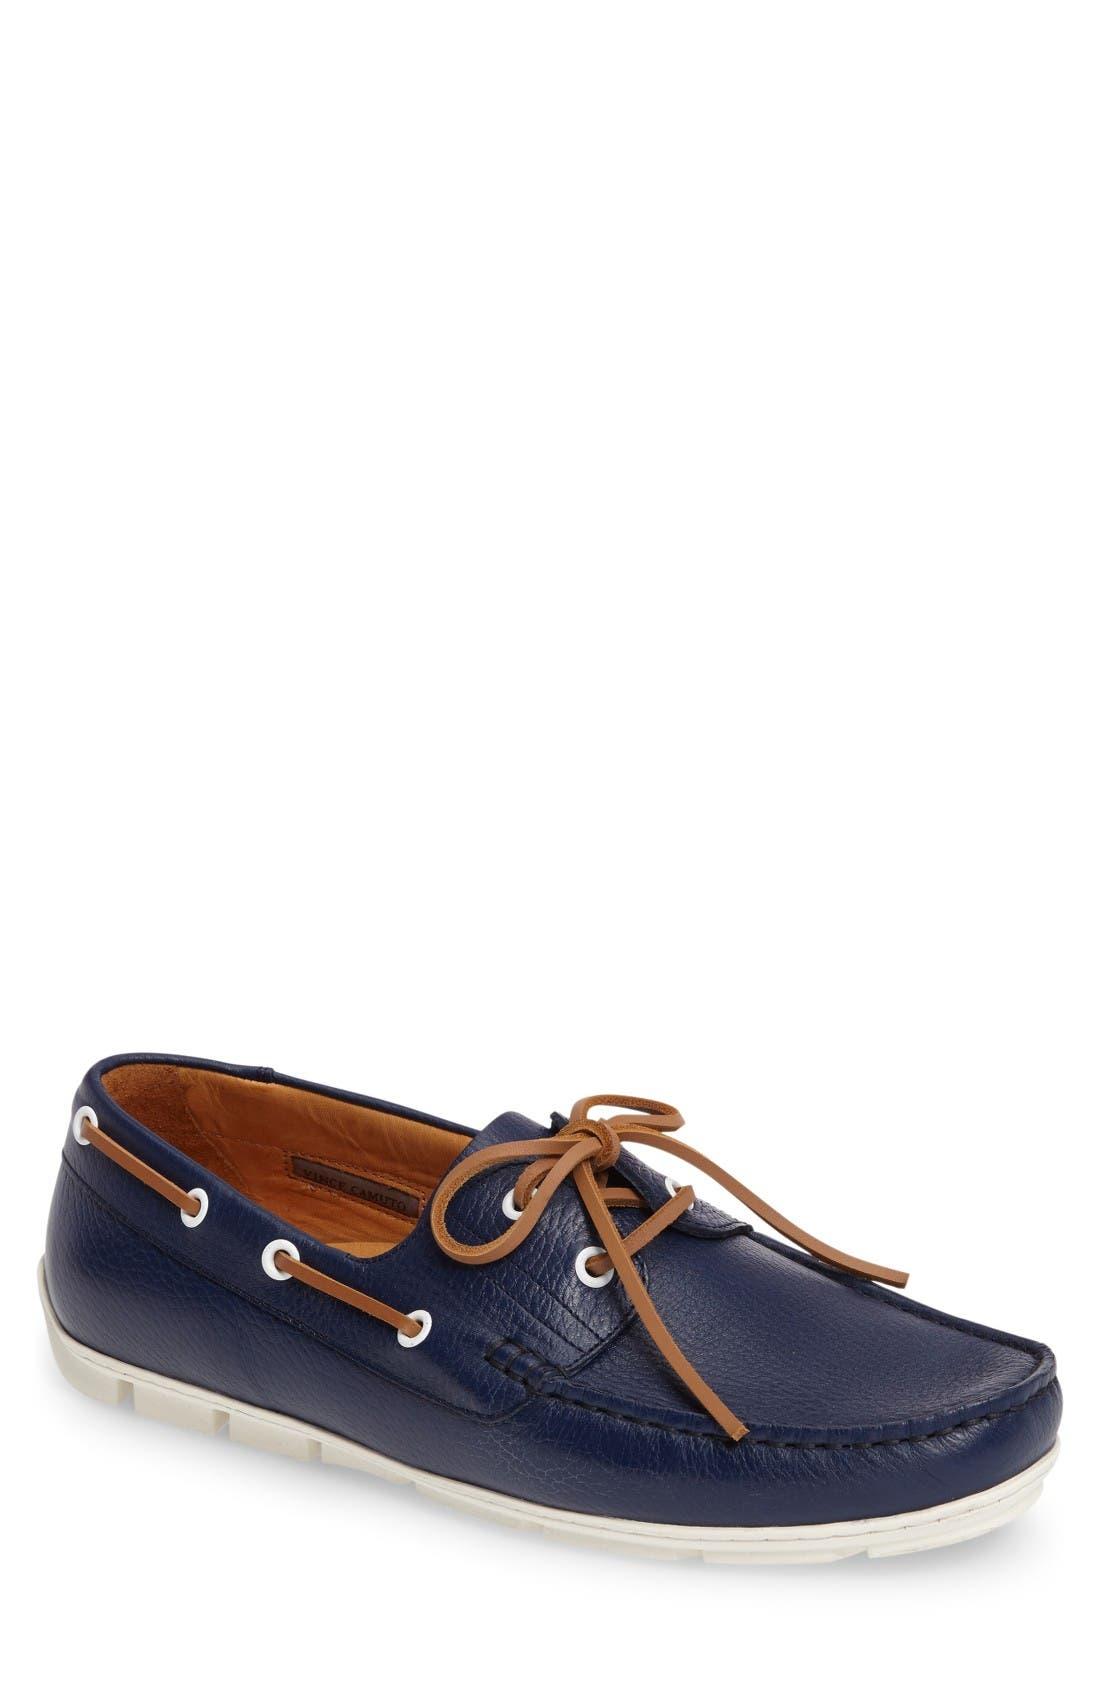 Main Image - Vince Camuto Don Boat Shoe (Men)